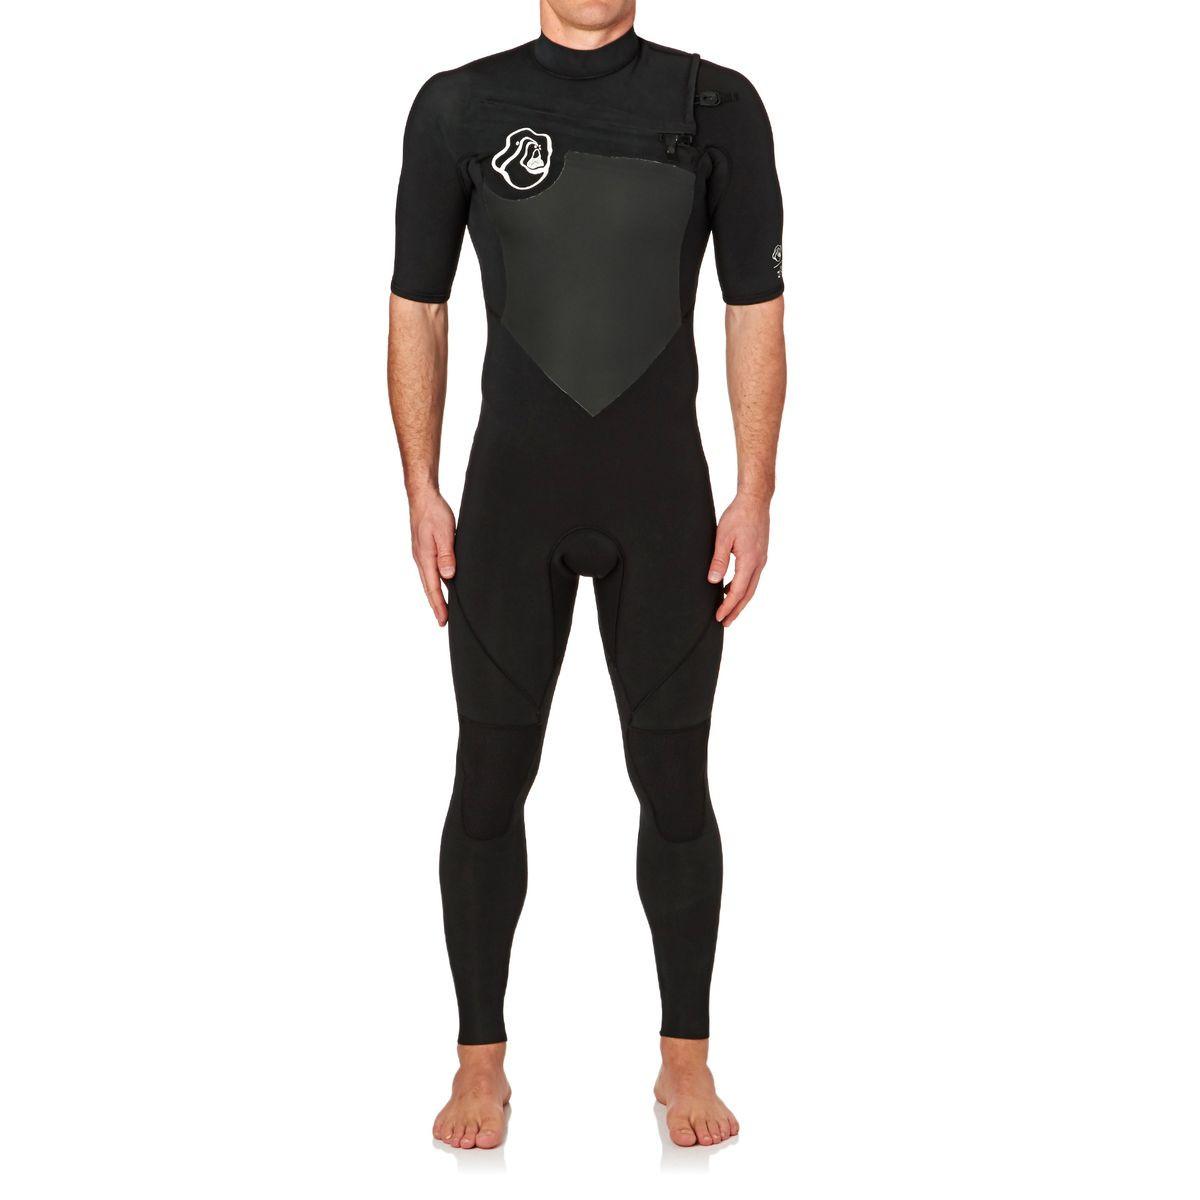 Quiksilver High Dye 2mm 2017 Chest Zip Short Sleeve Wetsuit - Black